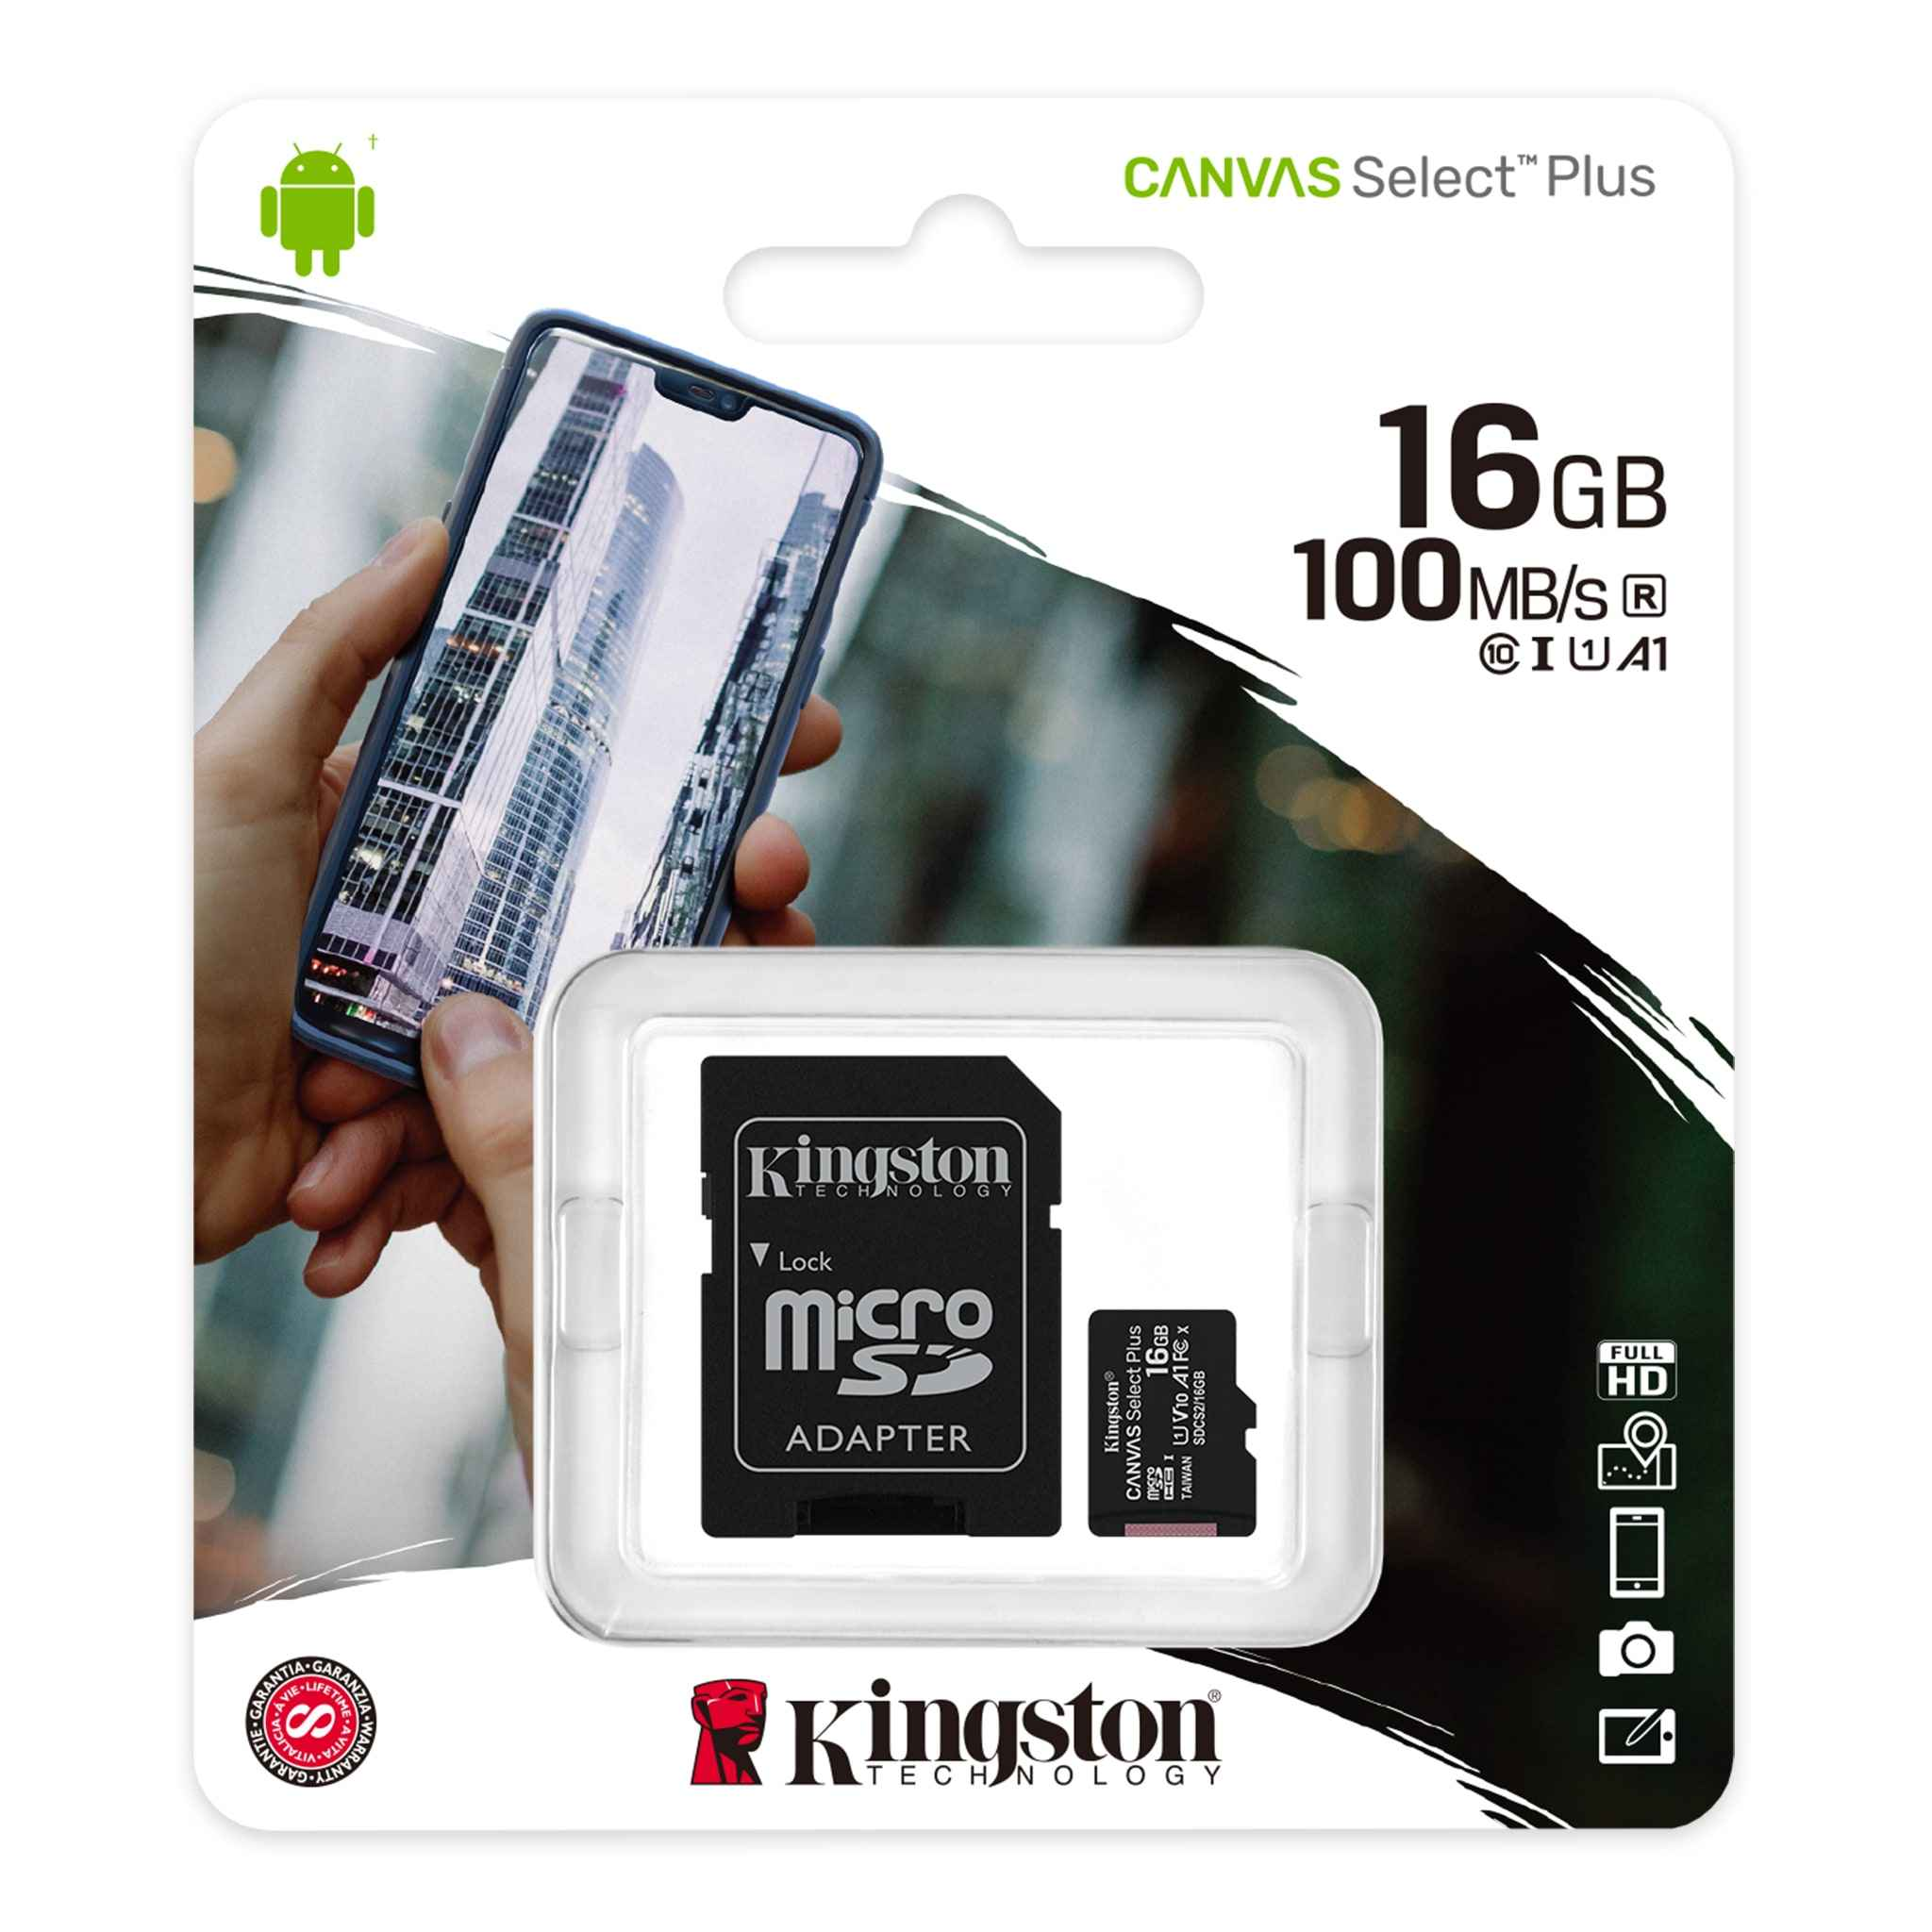 100MBs Works with Kingston Kingston 64GB Microsoft Lumia 535 MicroSDXC Canvas Select Plus Card Verified by SanFlash.